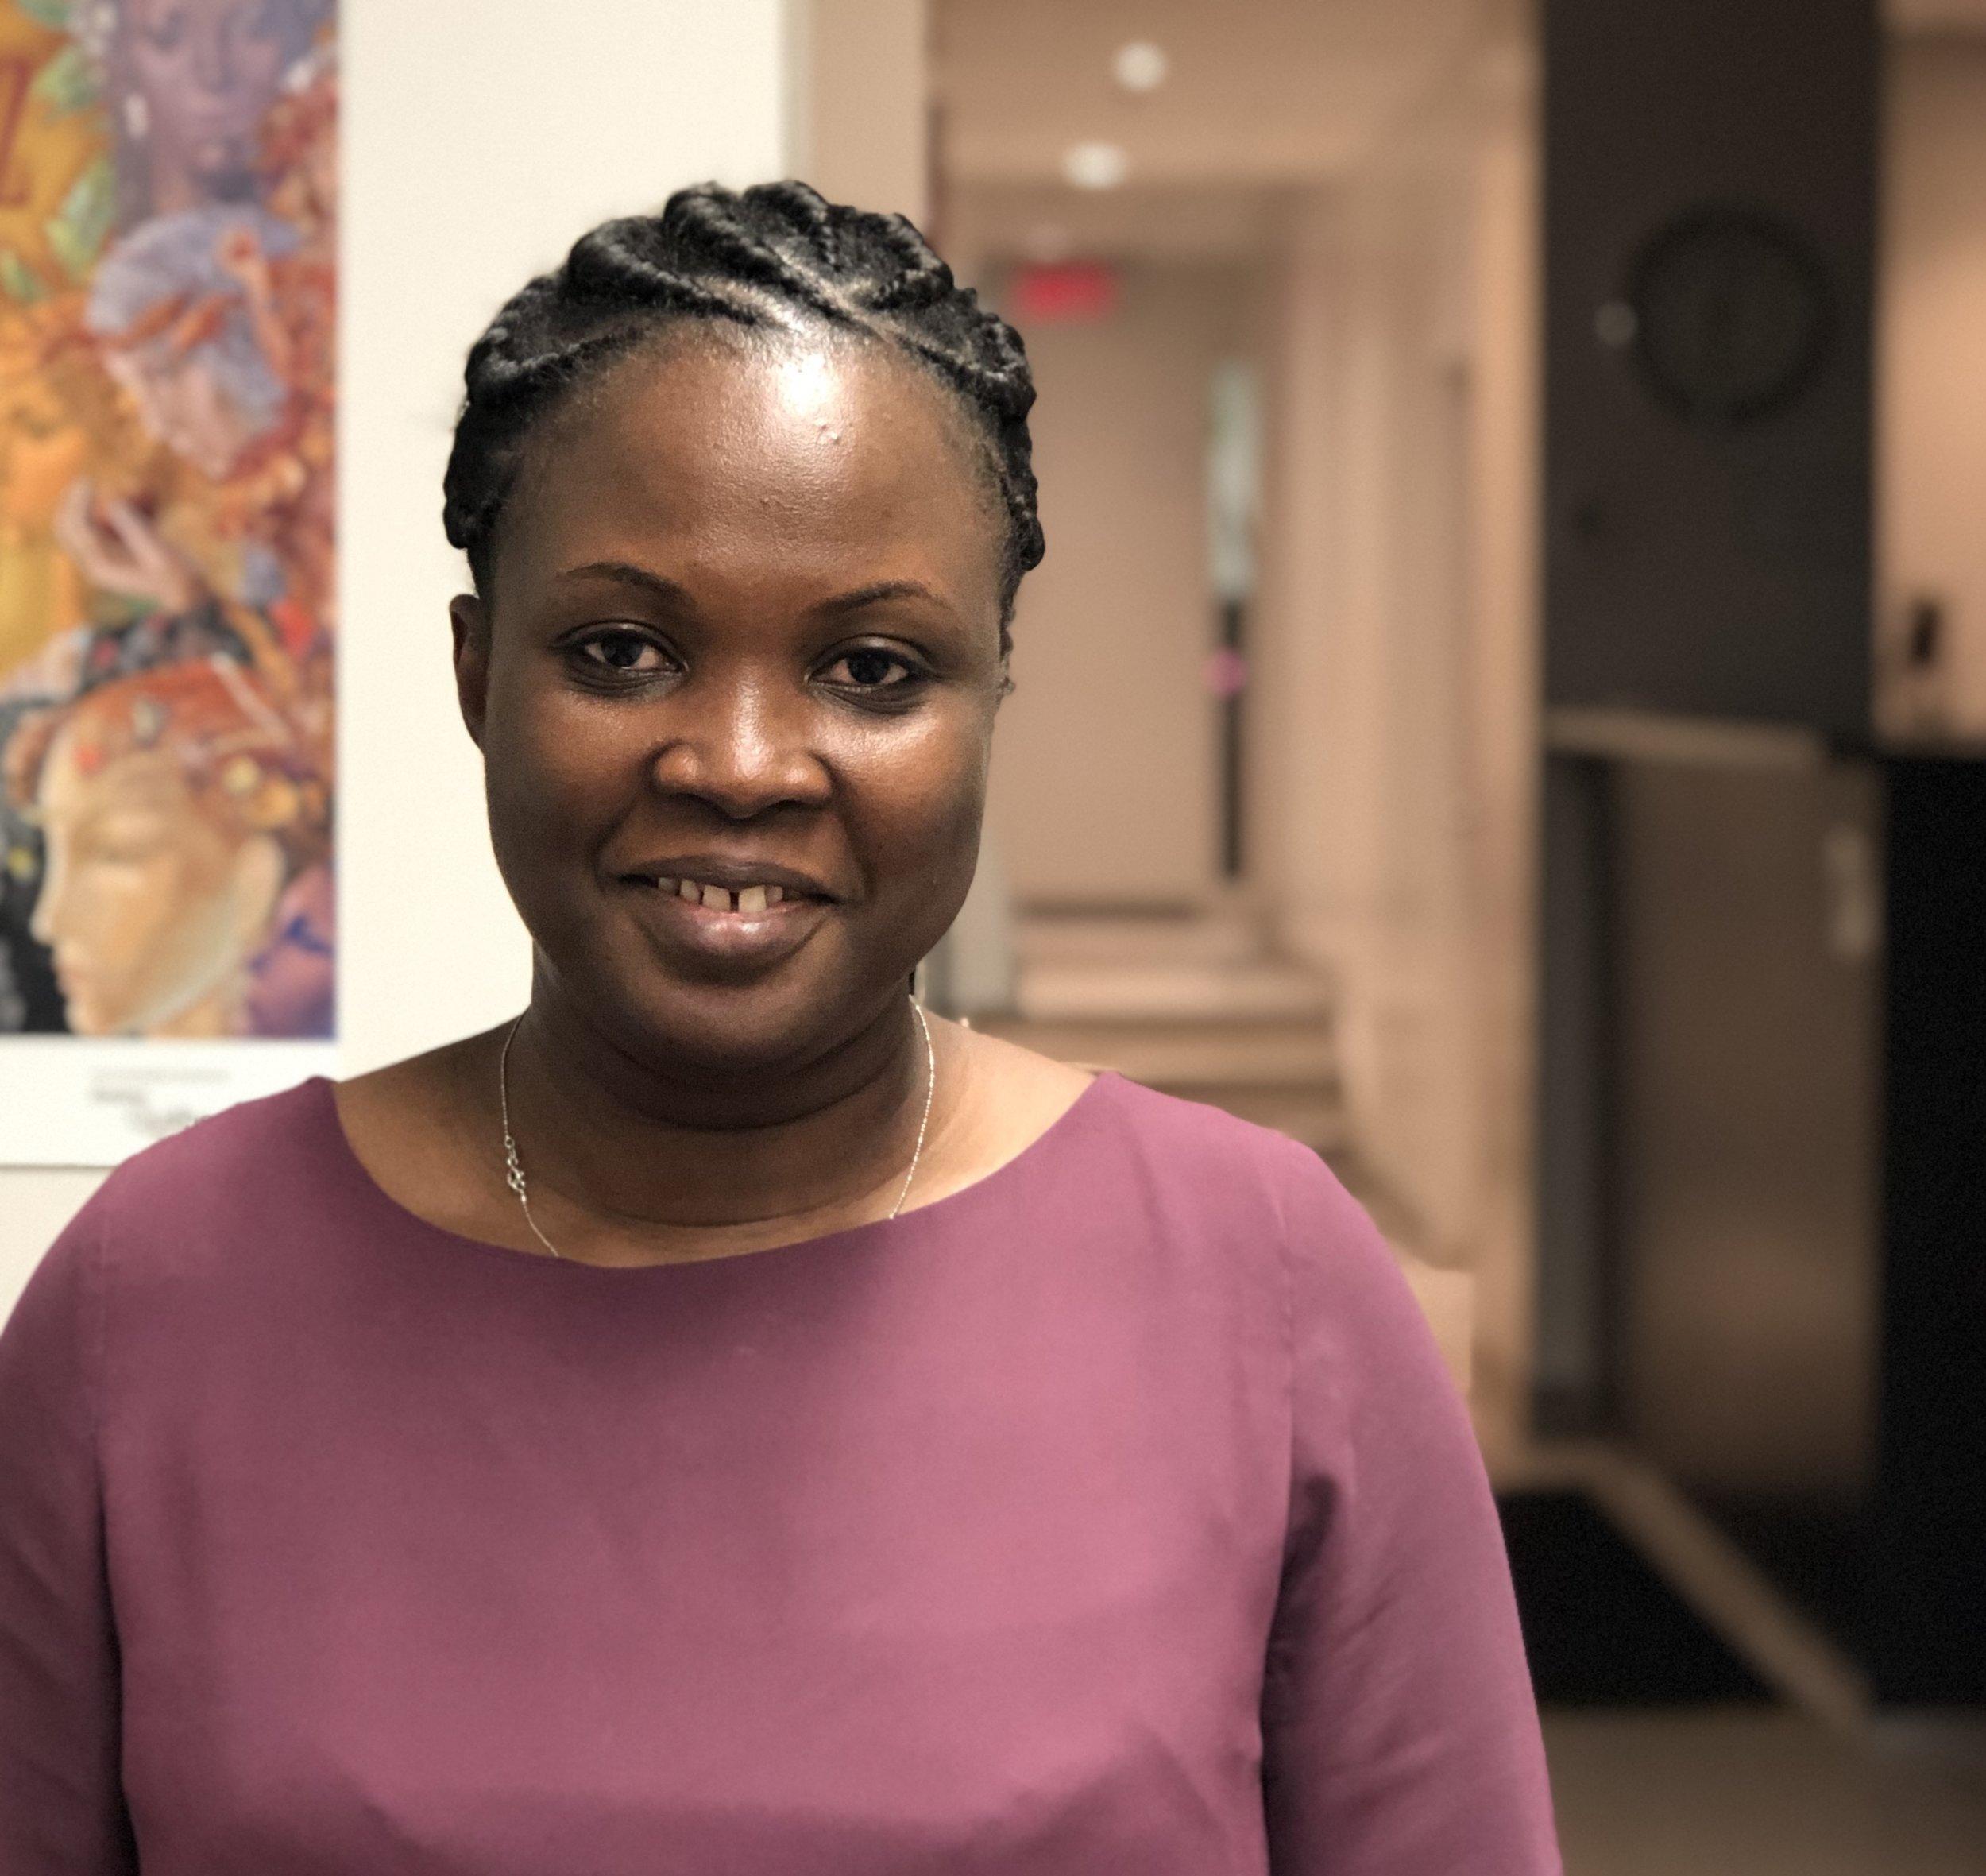 Ms. Barakissa Savadogo, User member